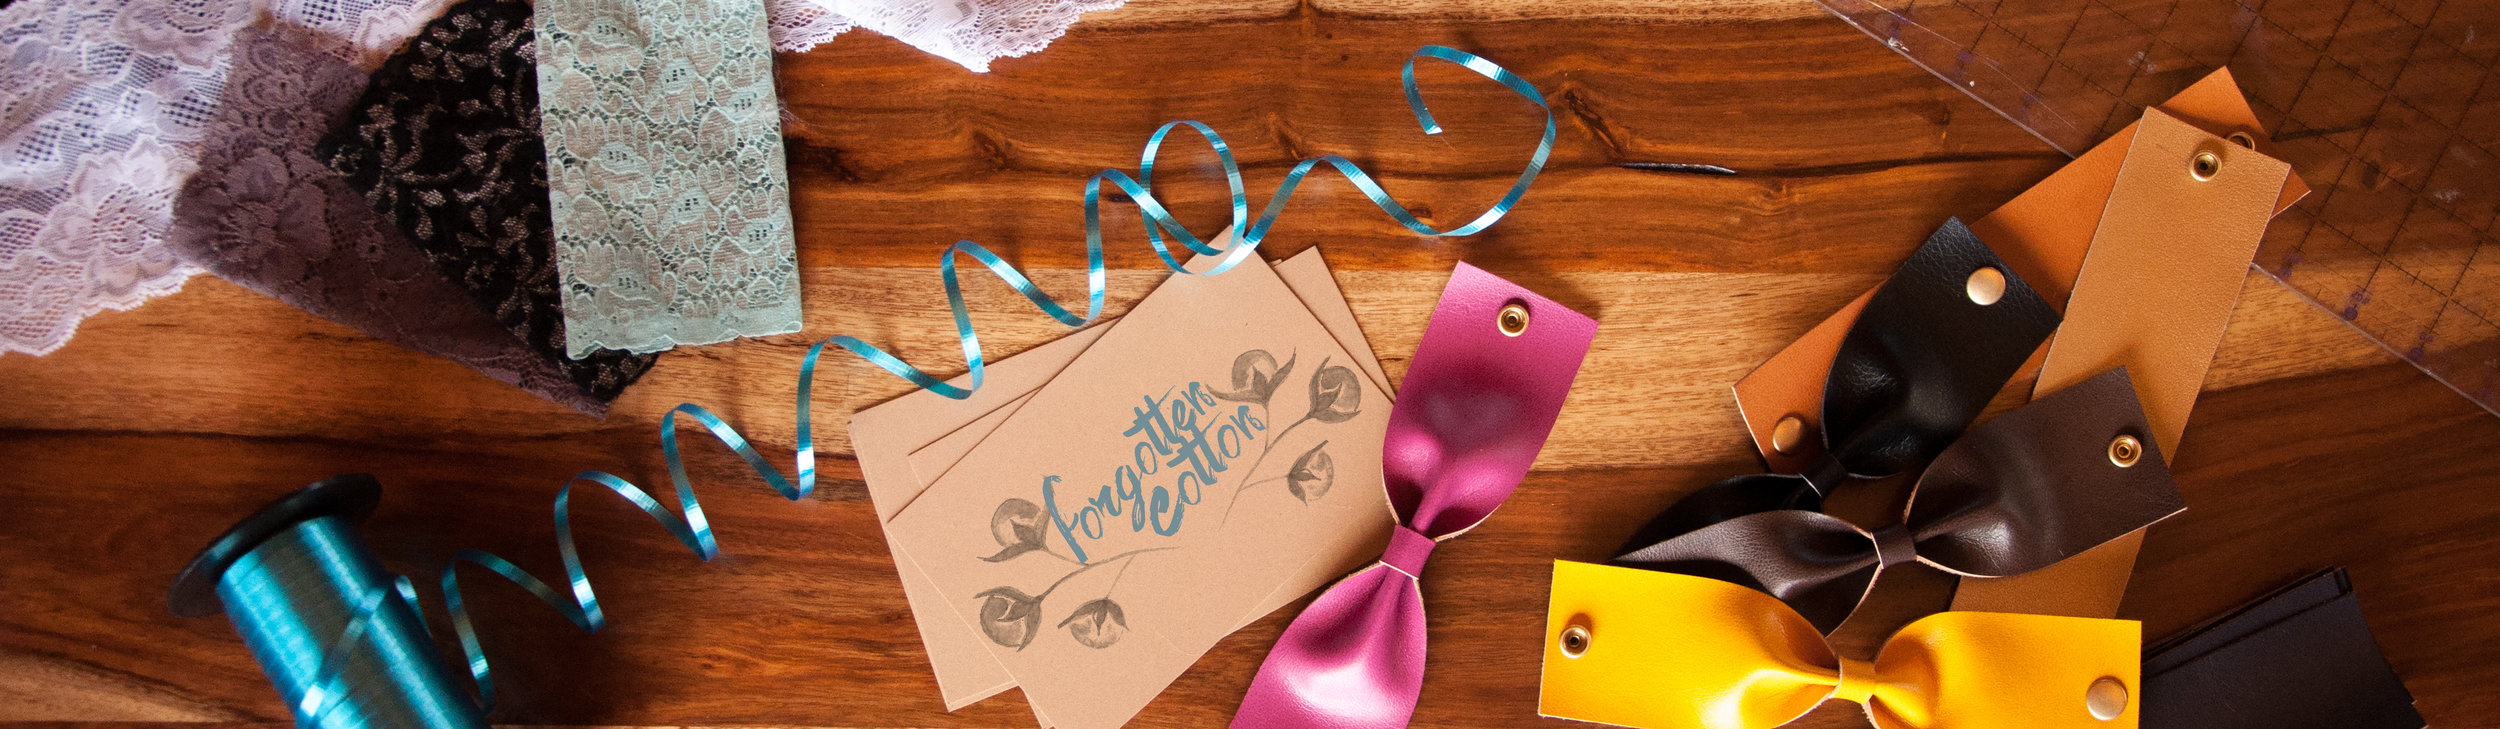 amazon-handmade-banner-forgotten-cotton